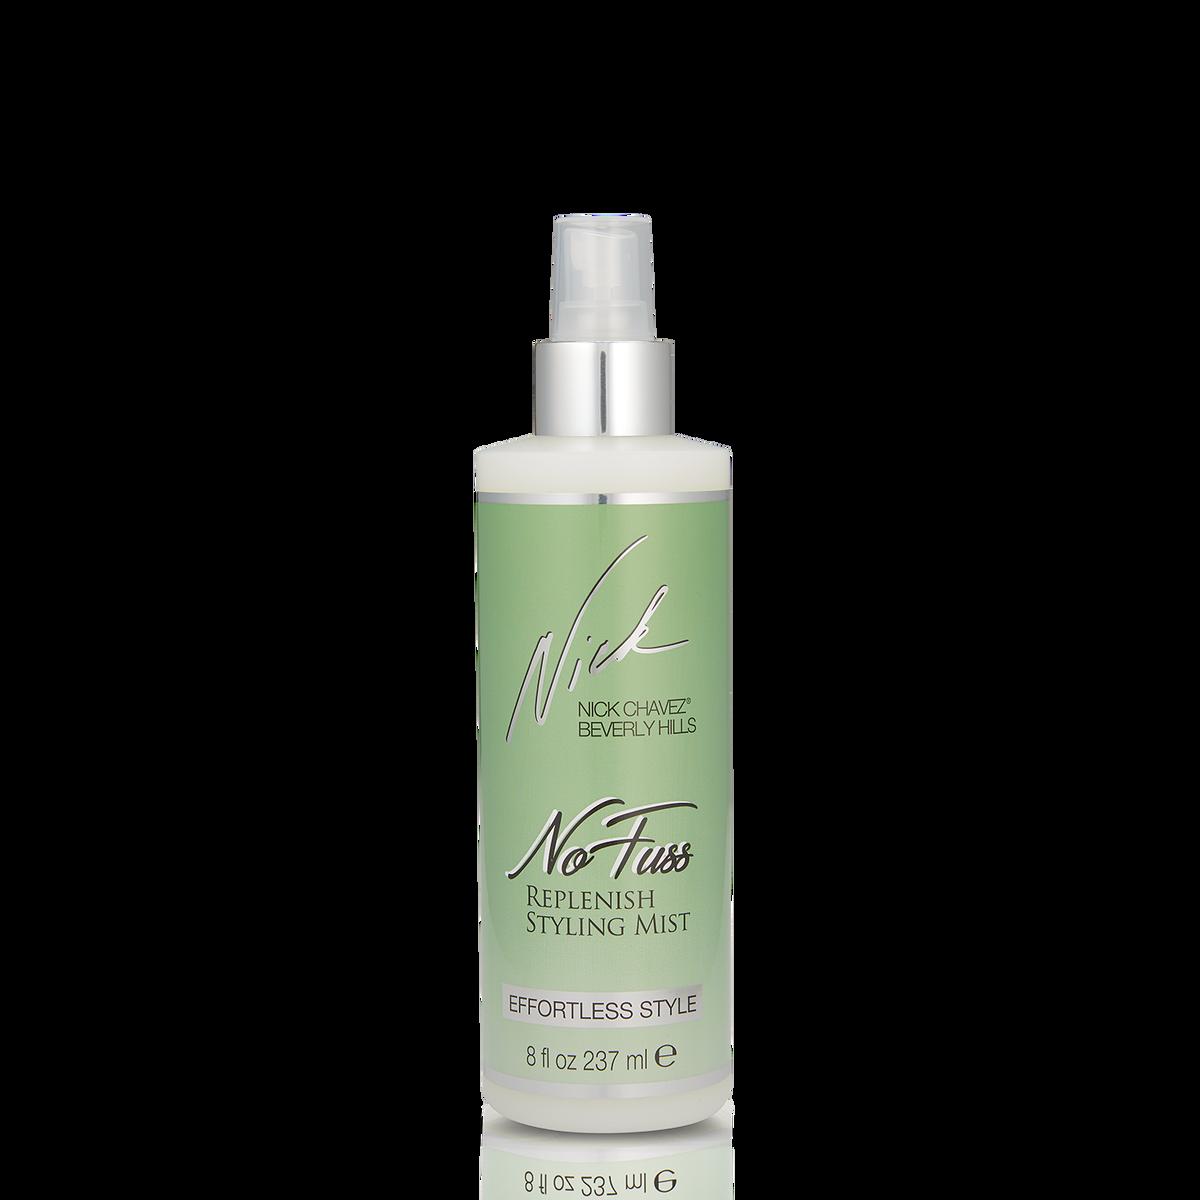 8oz No Fuss Replenish Styling Mist